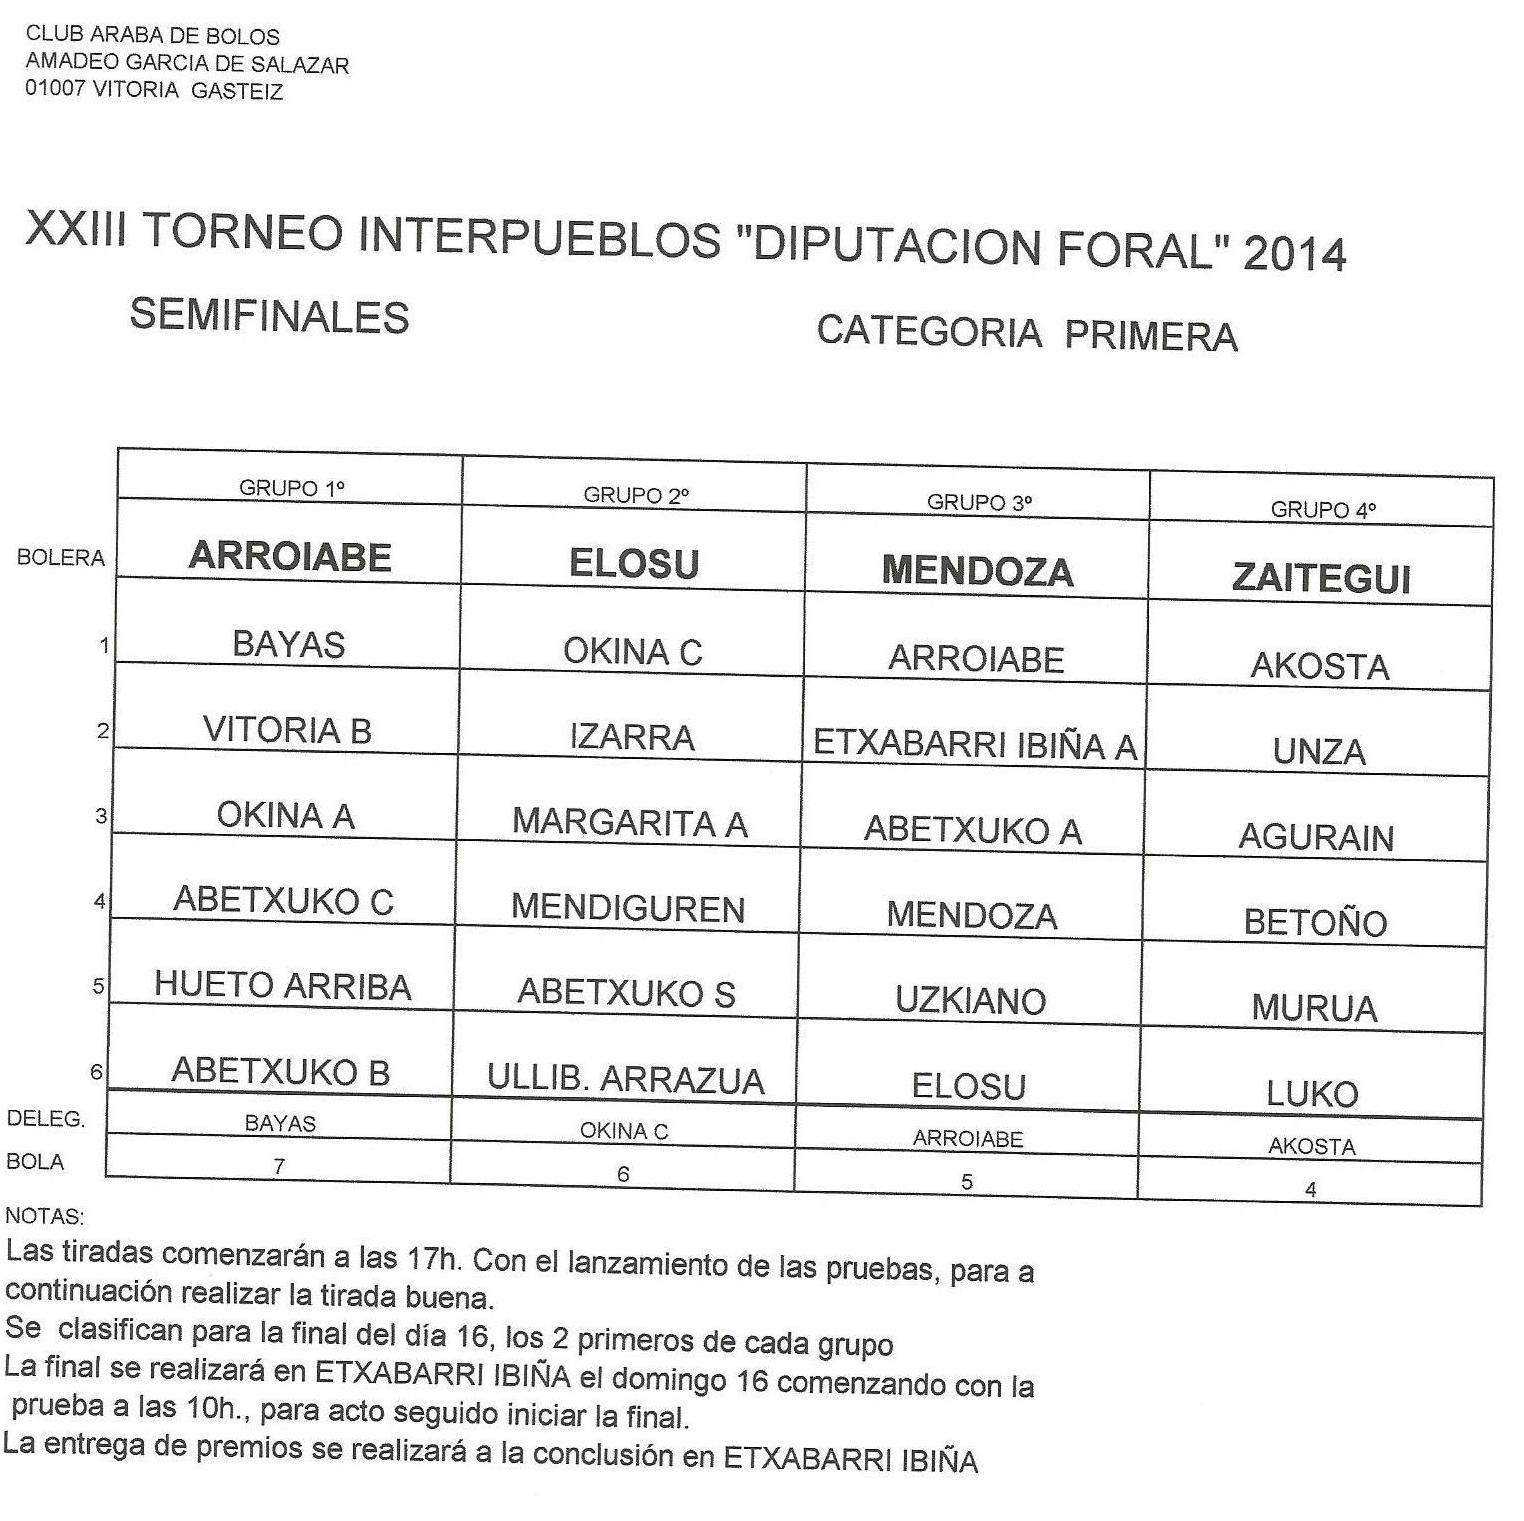 Sorteo semifinales diputacion 2014-1